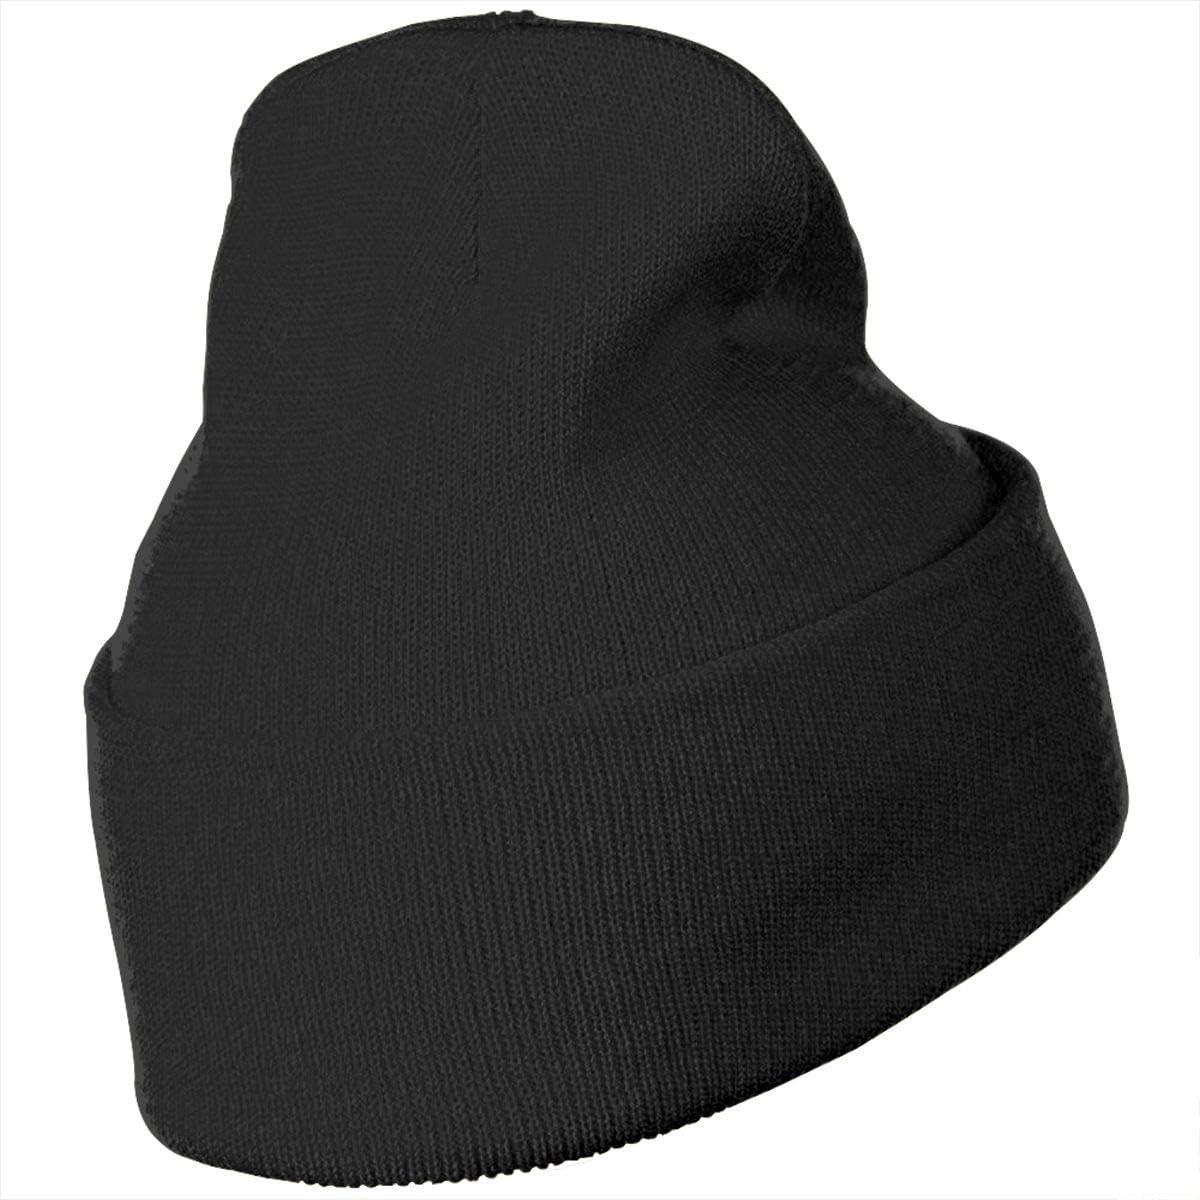 Xugui Avocado Pattern Beanie Hat Unisex Plain Cuff Cap Chunky Cuff Skull Beanie